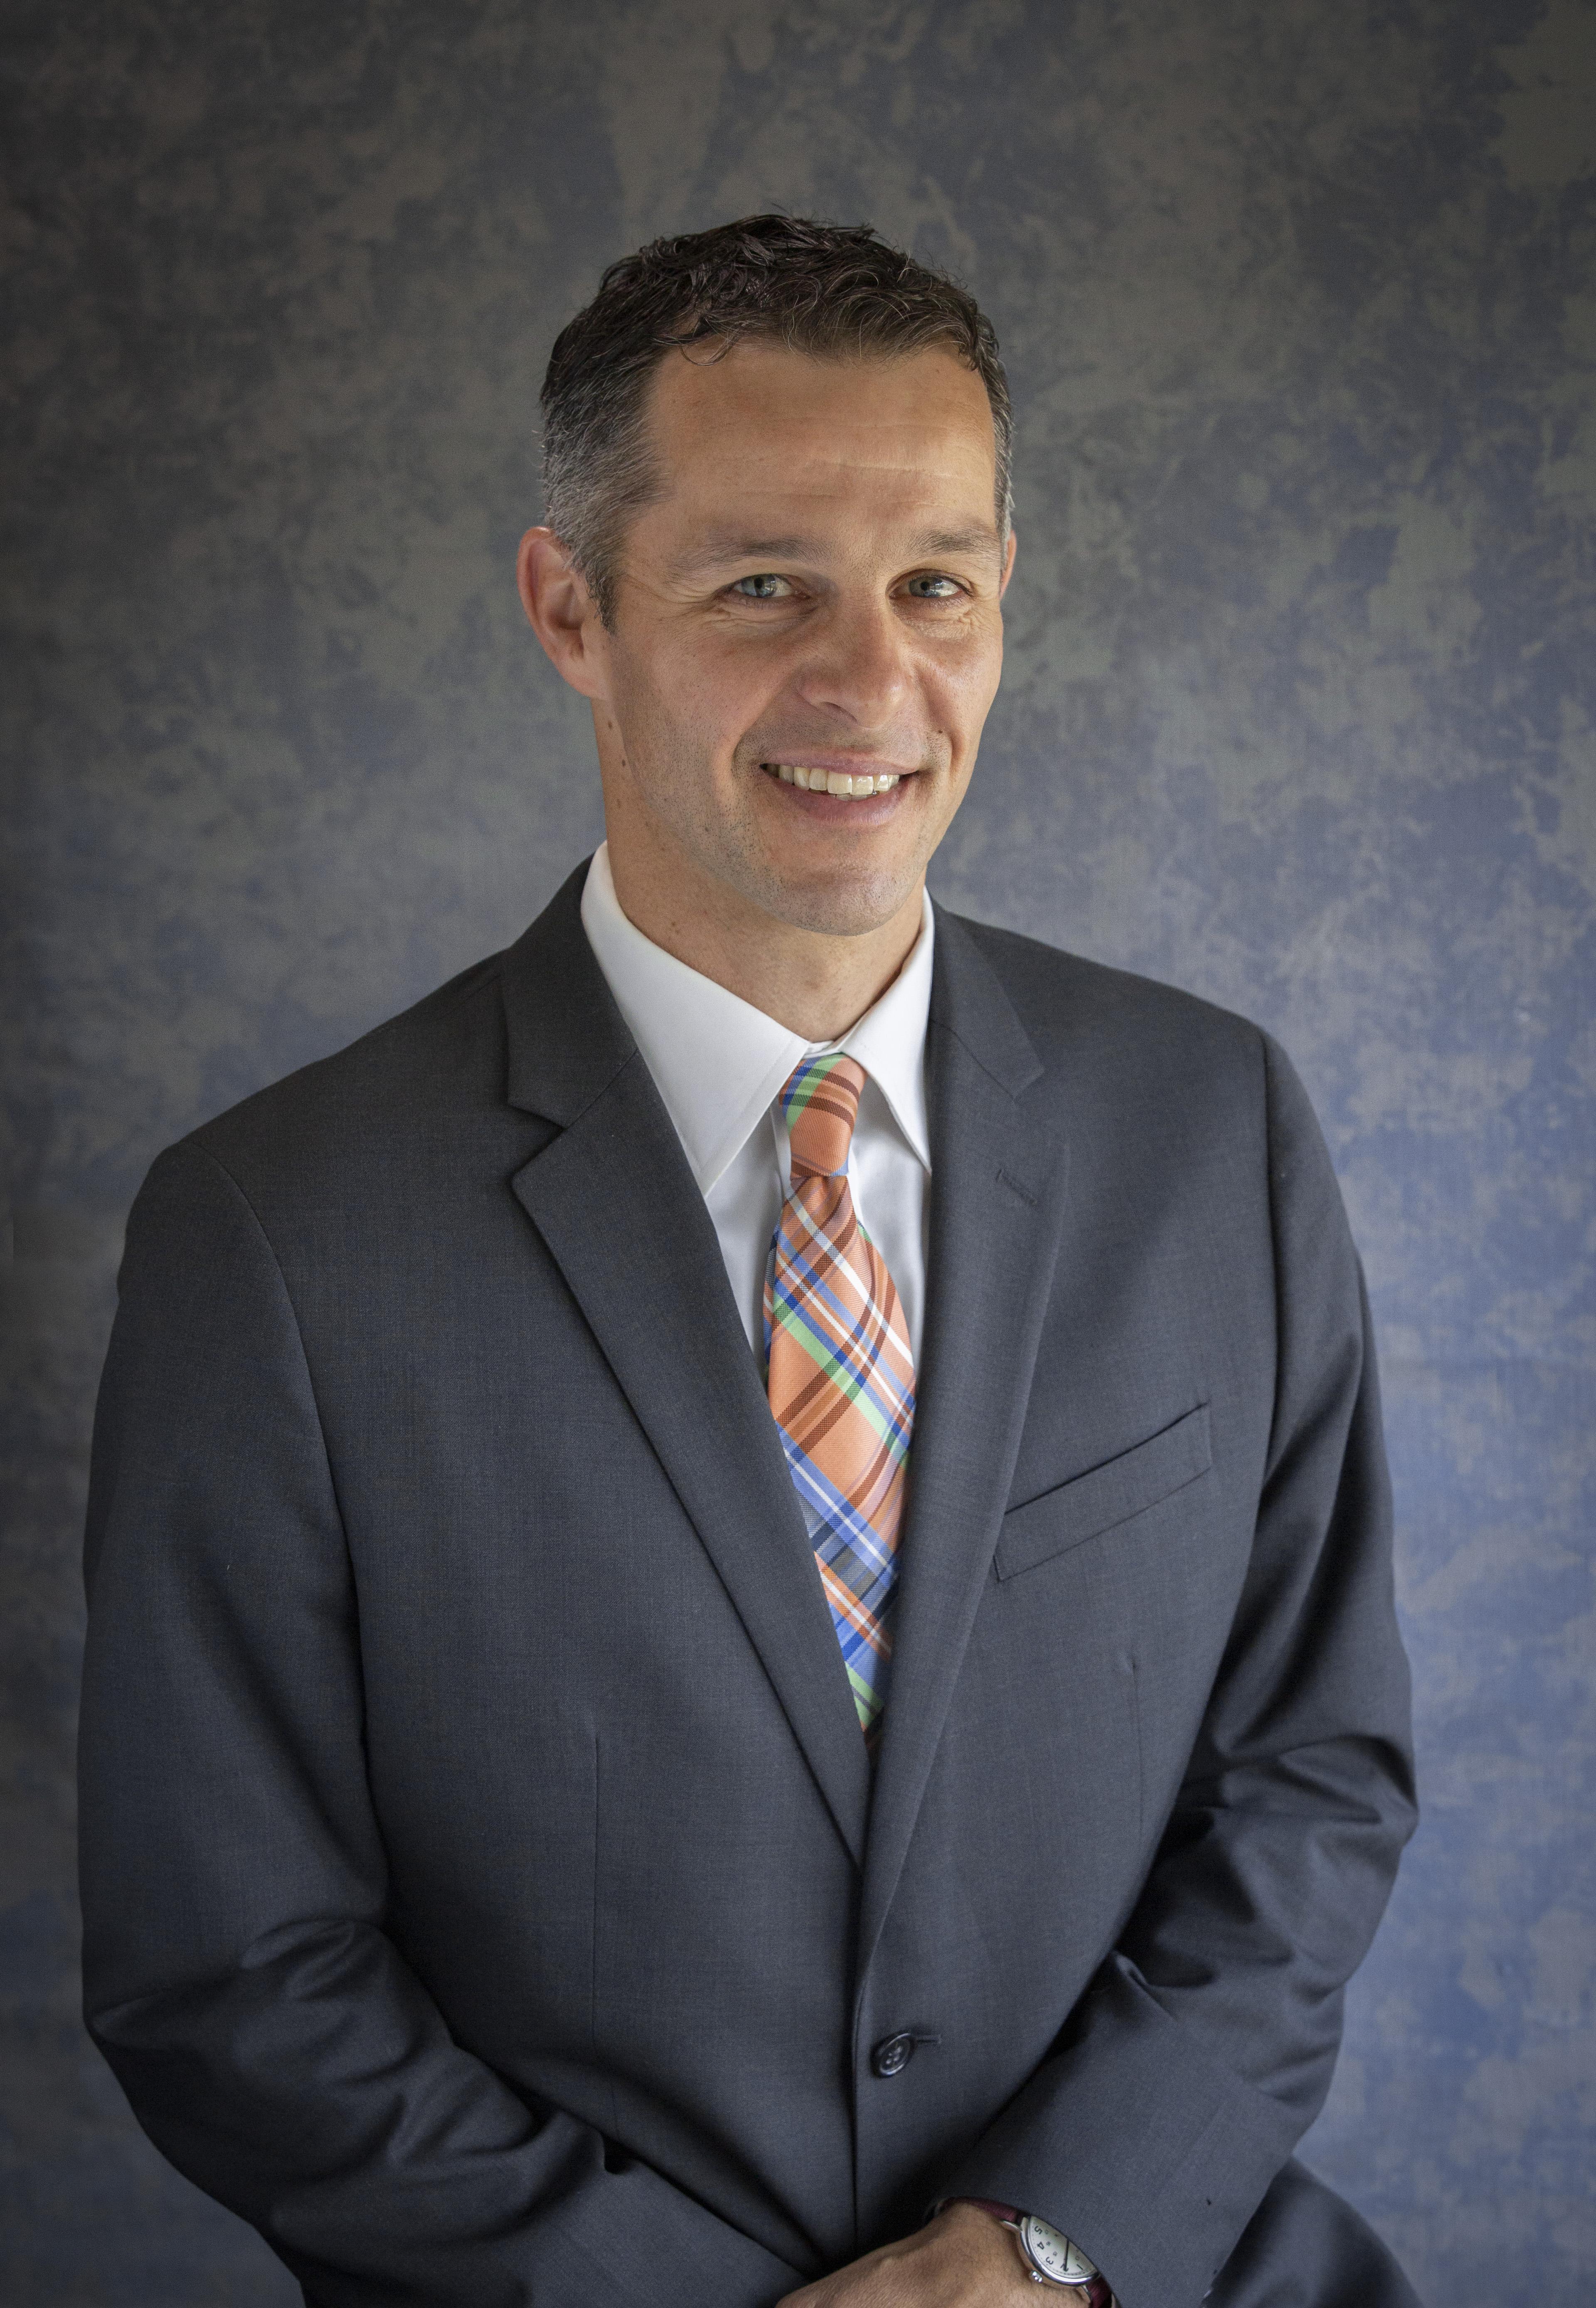 Chris Eatough